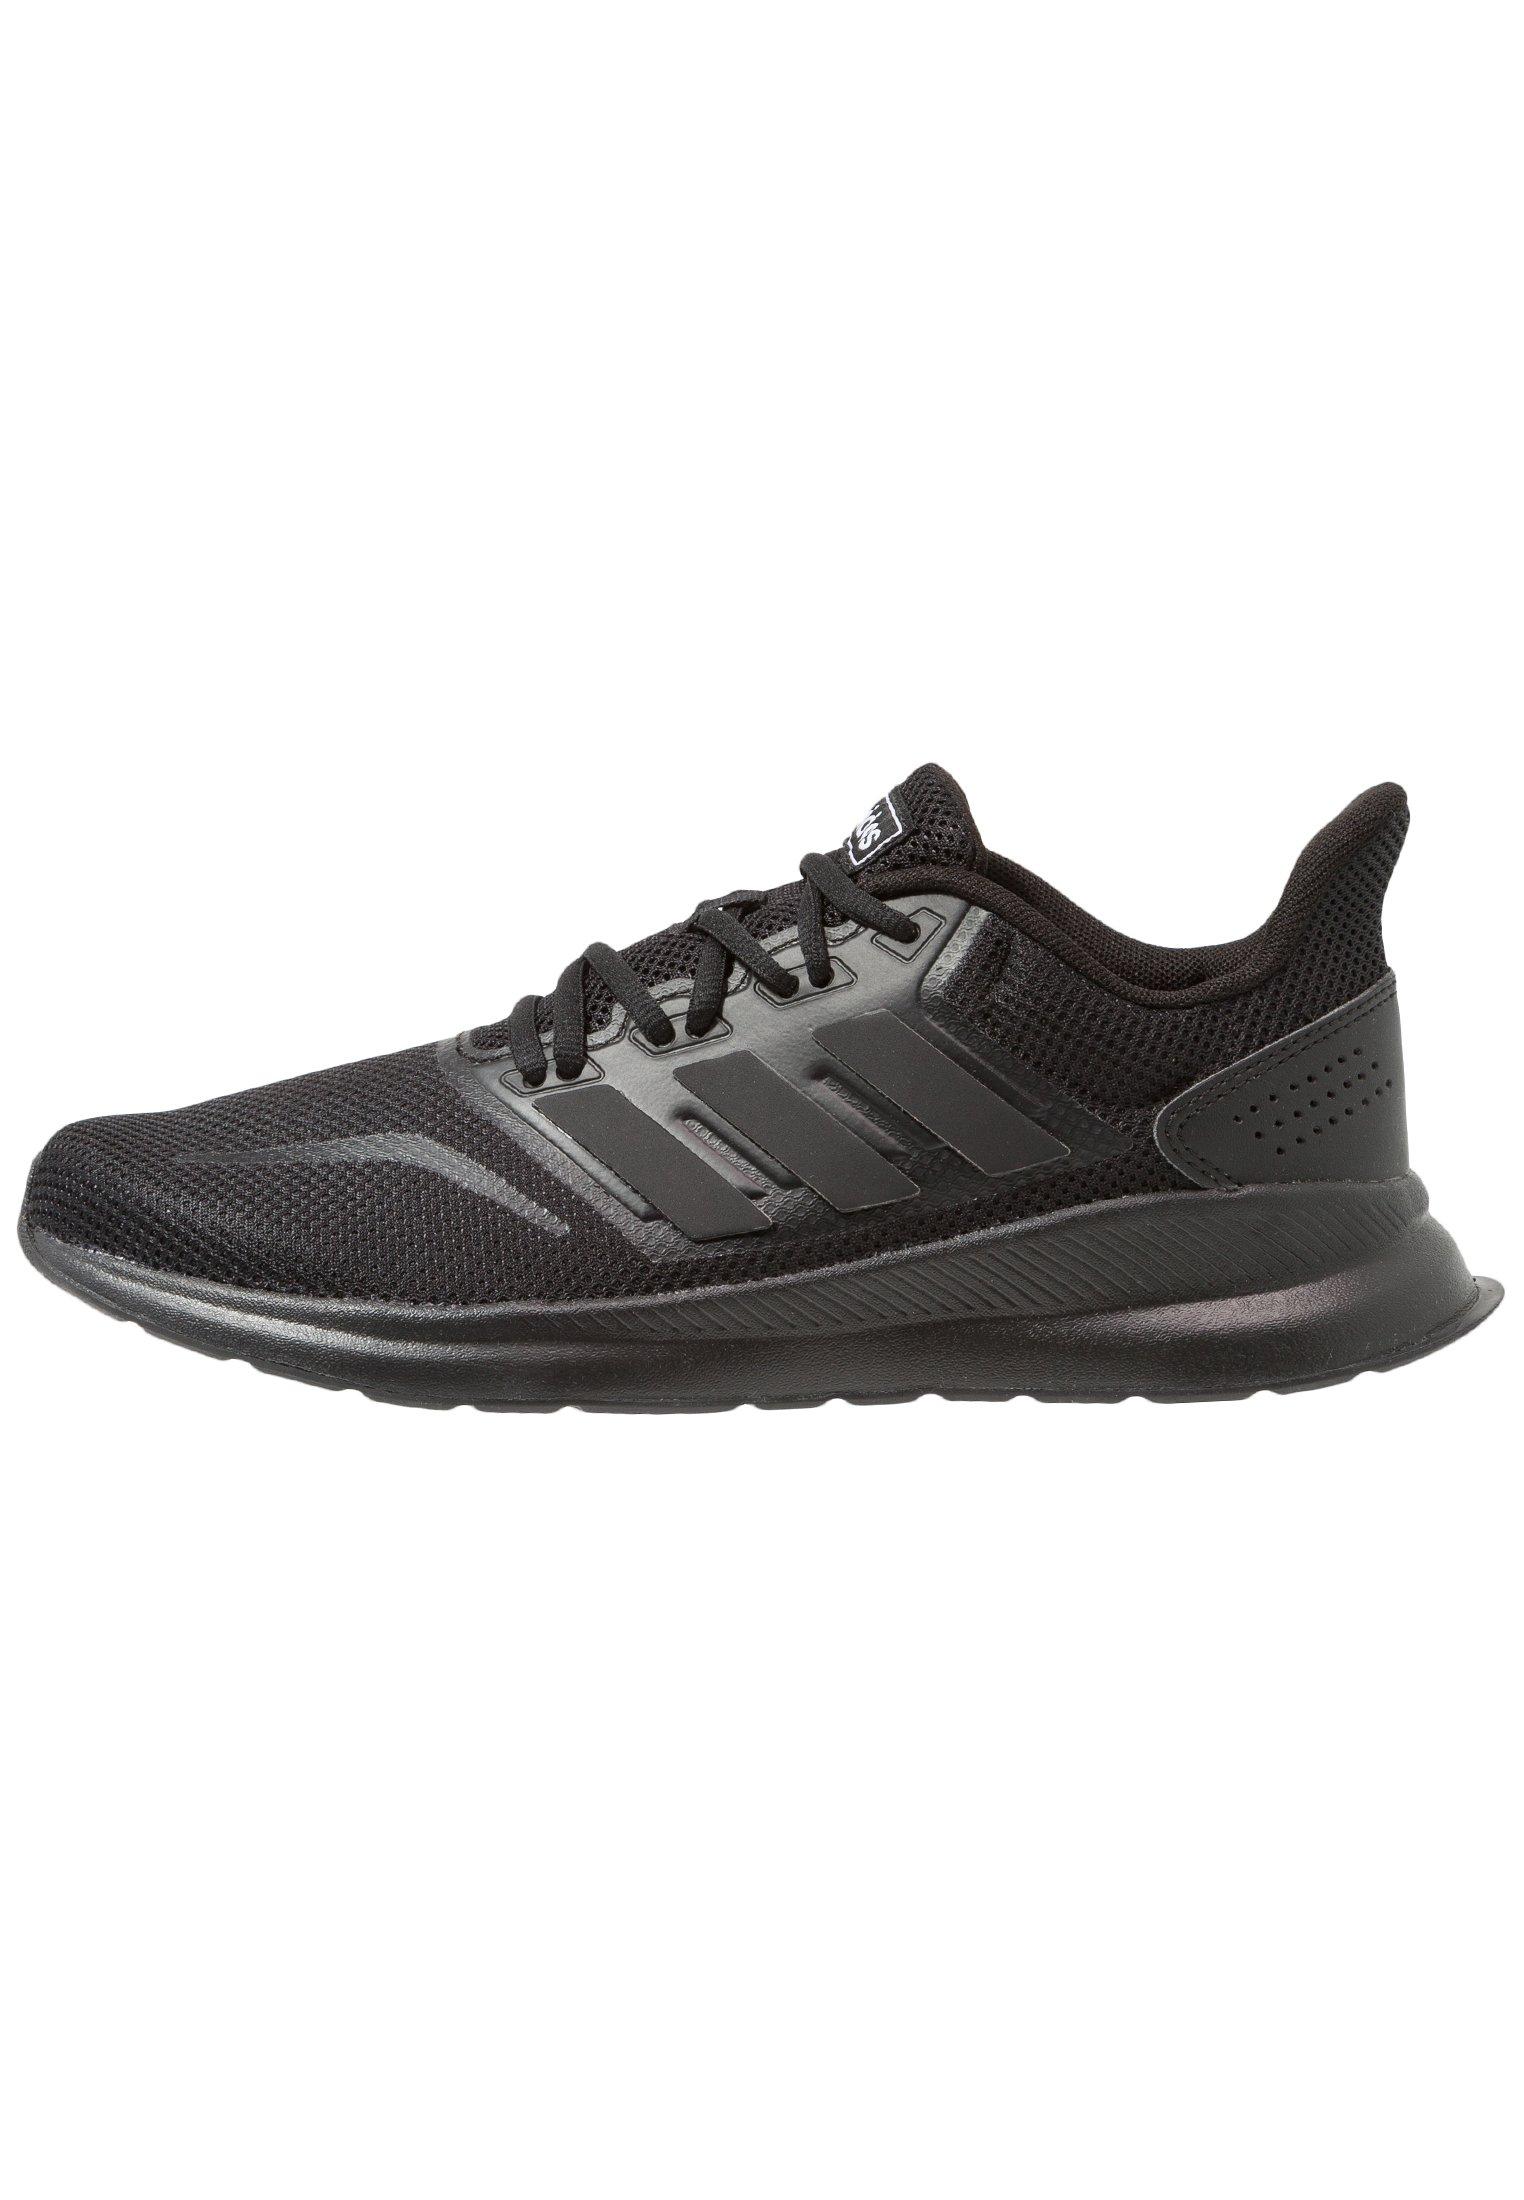 adidas Performance RUNFALCON Hardloopschoenen neutraal